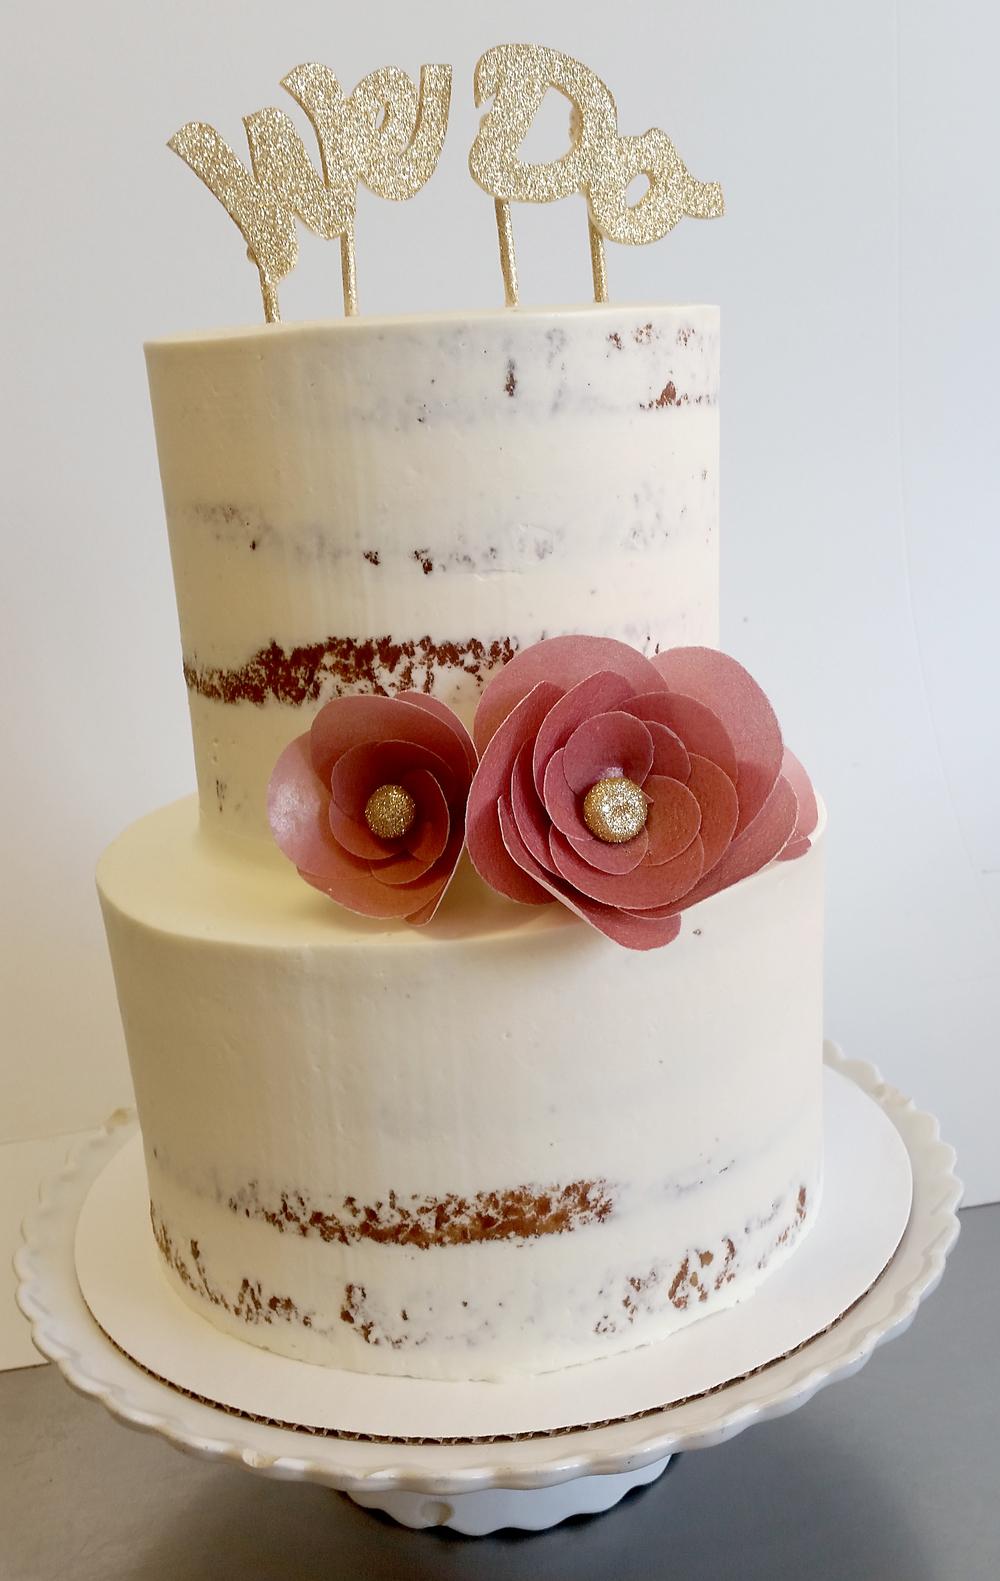 Rice paper flowers wedding cake topsimages rice paper flowers wedding cake jpg 1000x1581 rice paper flowers wedding cake mightylinksfo